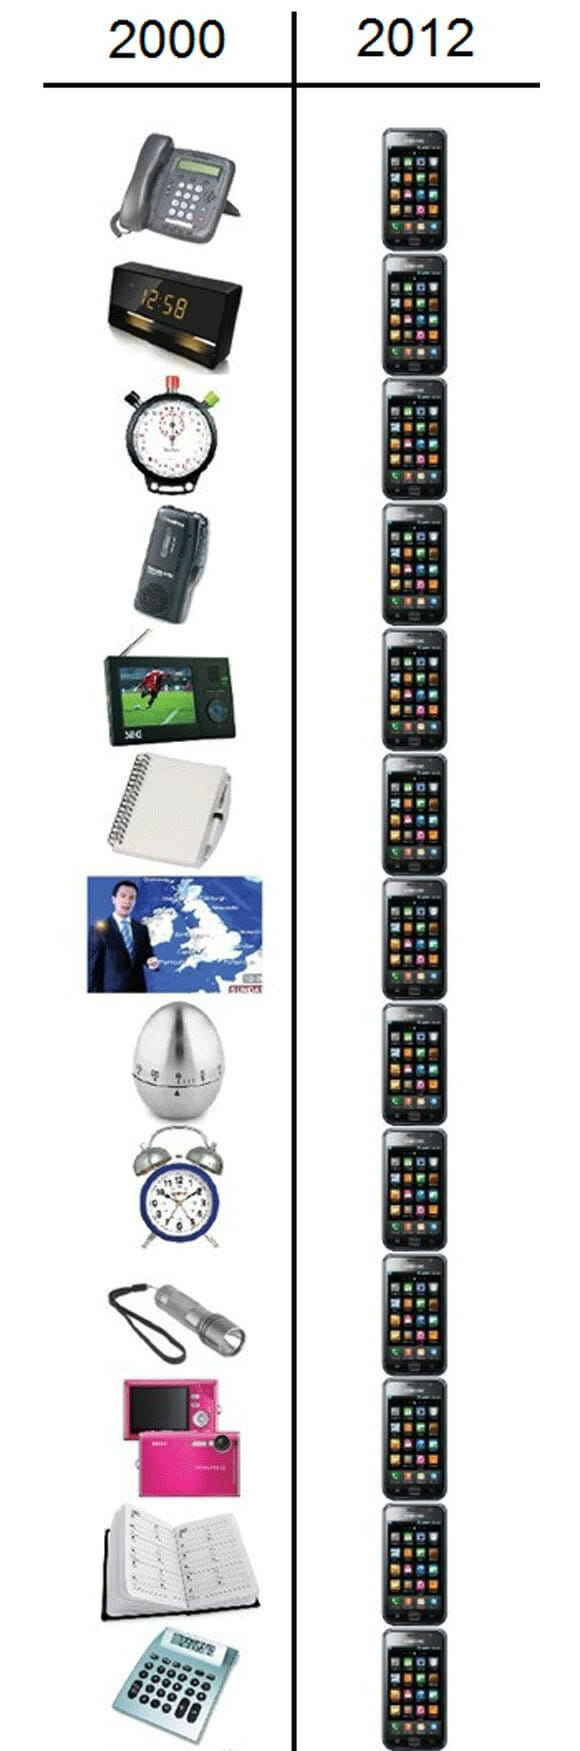 Gadgets em 2000 vs gadgets em 2012